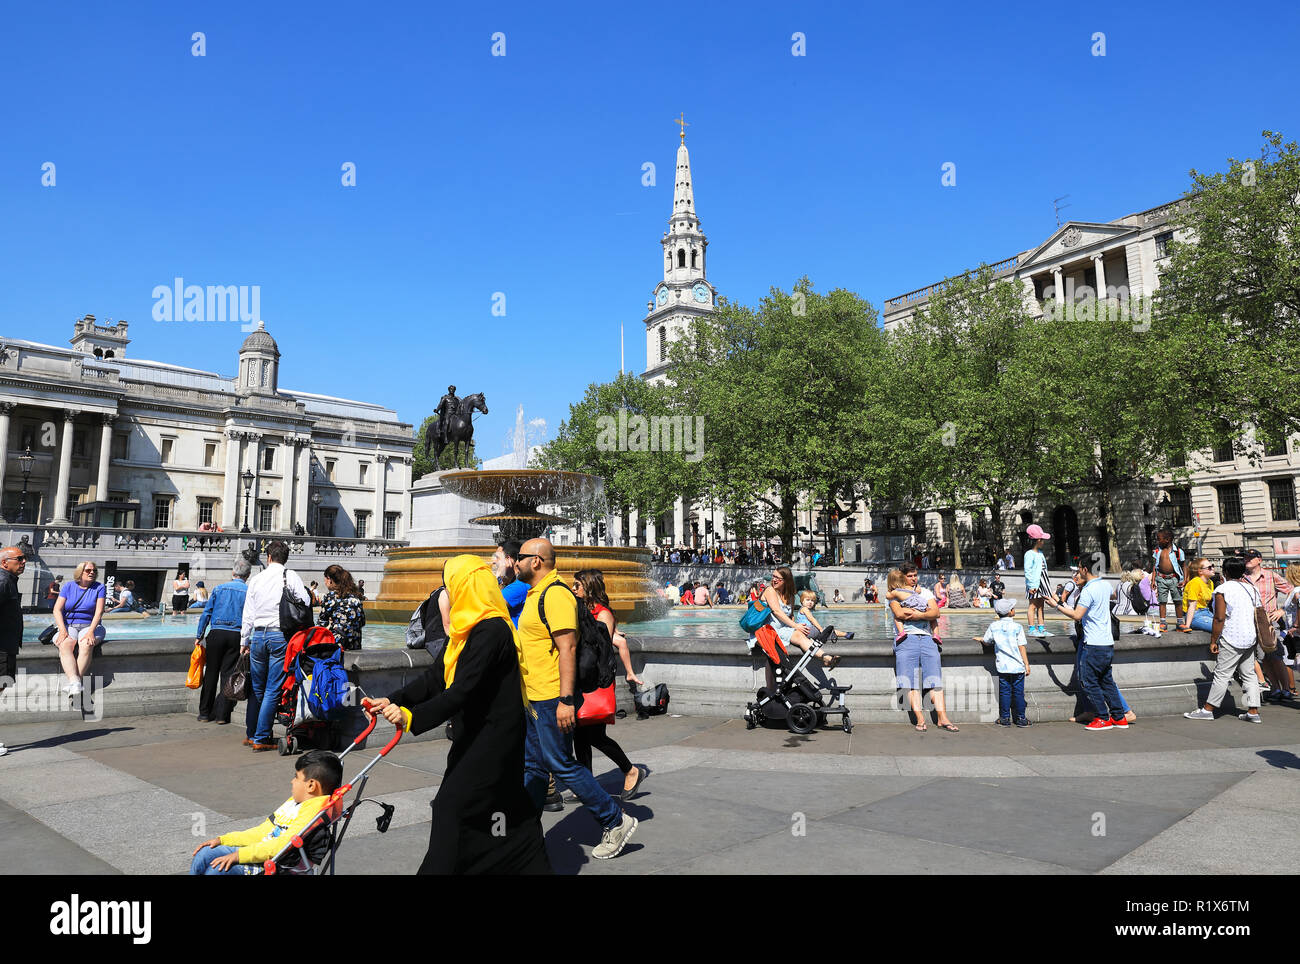 Diversity of visitors to Trafalgar Square, in central London, UK - Stock Image